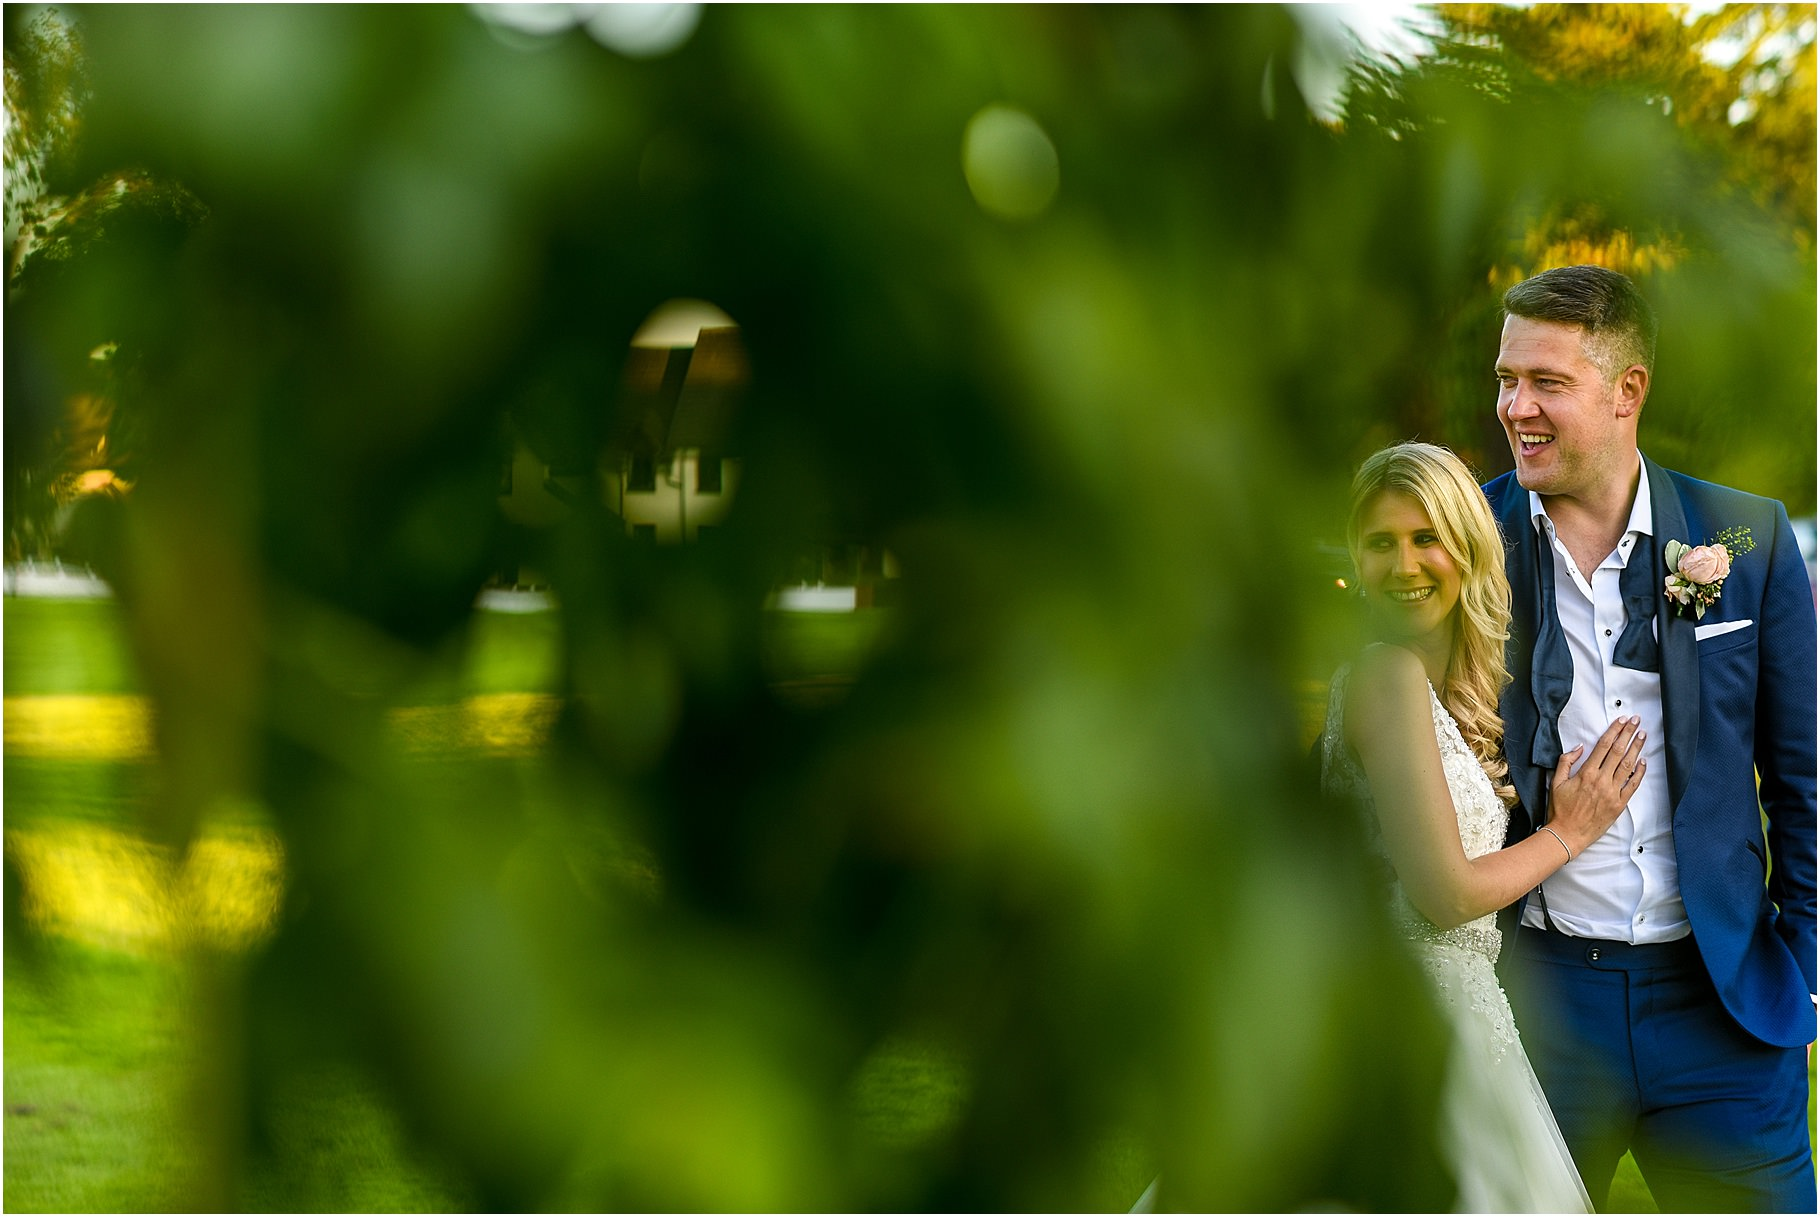 the-villa-wrea-green-wedding-60.jpg